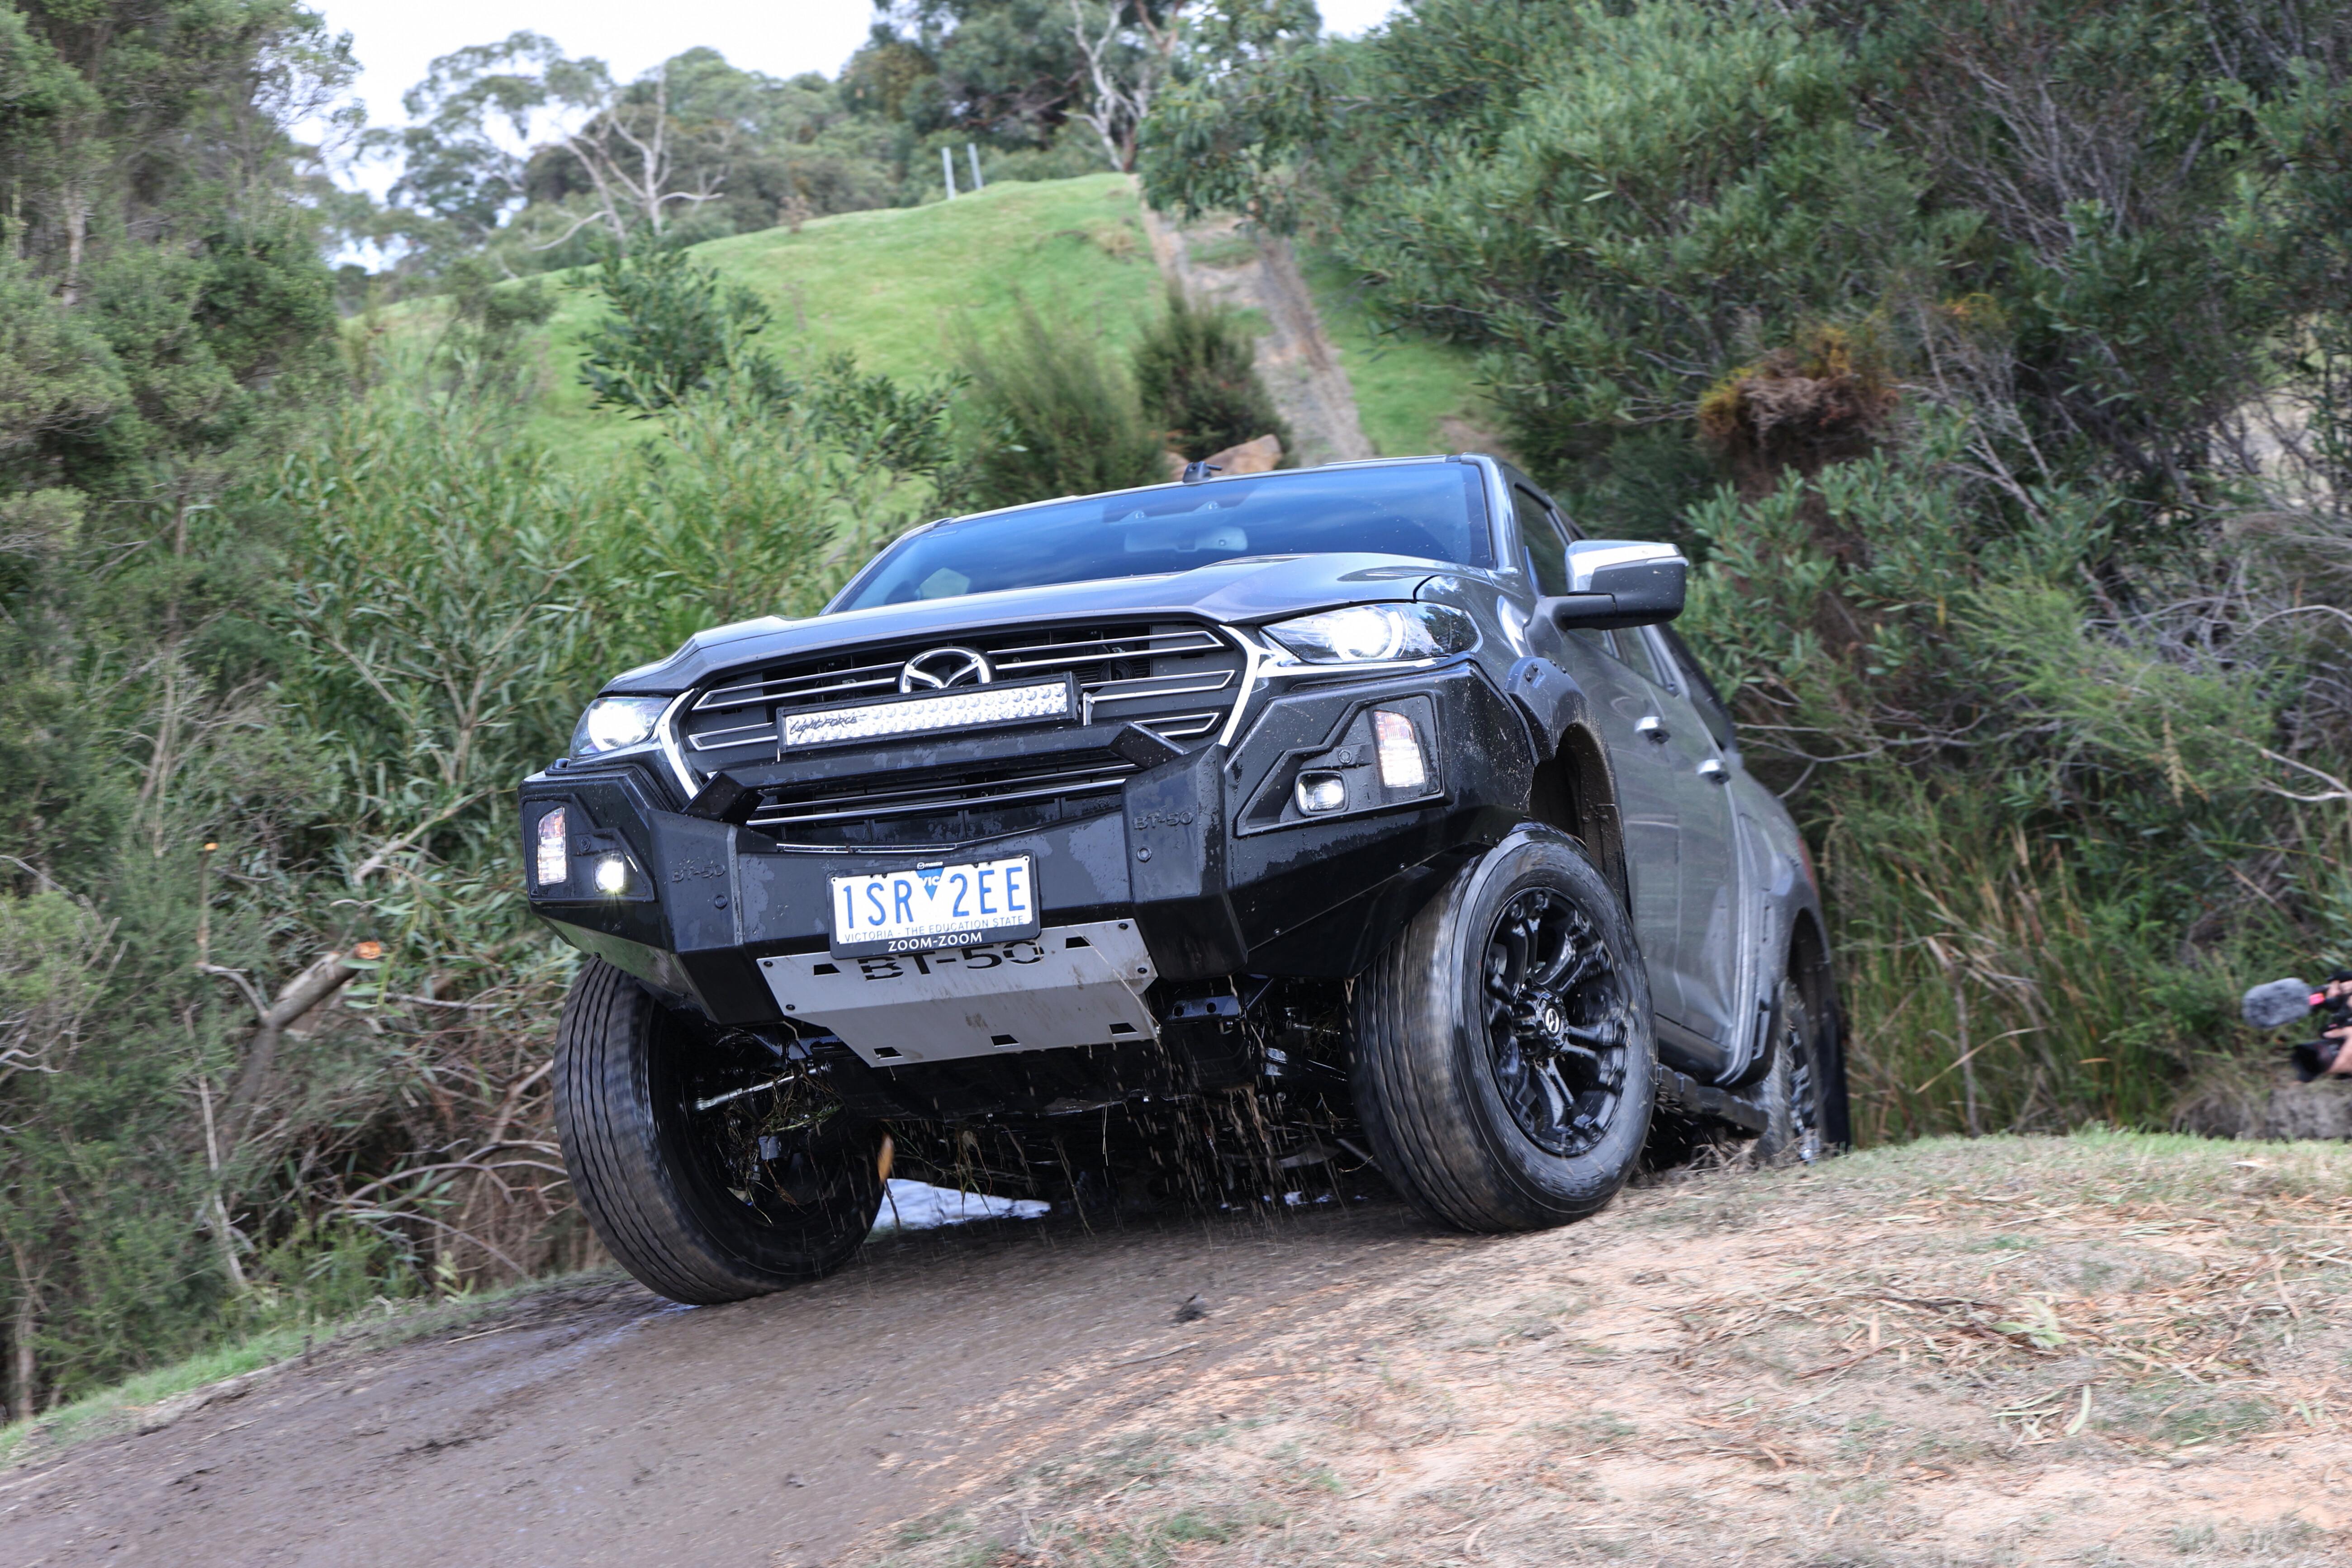 4 X 4 Australia Comparisons 2021 May 21 Mazda BT 50 Thunder Hillclimb